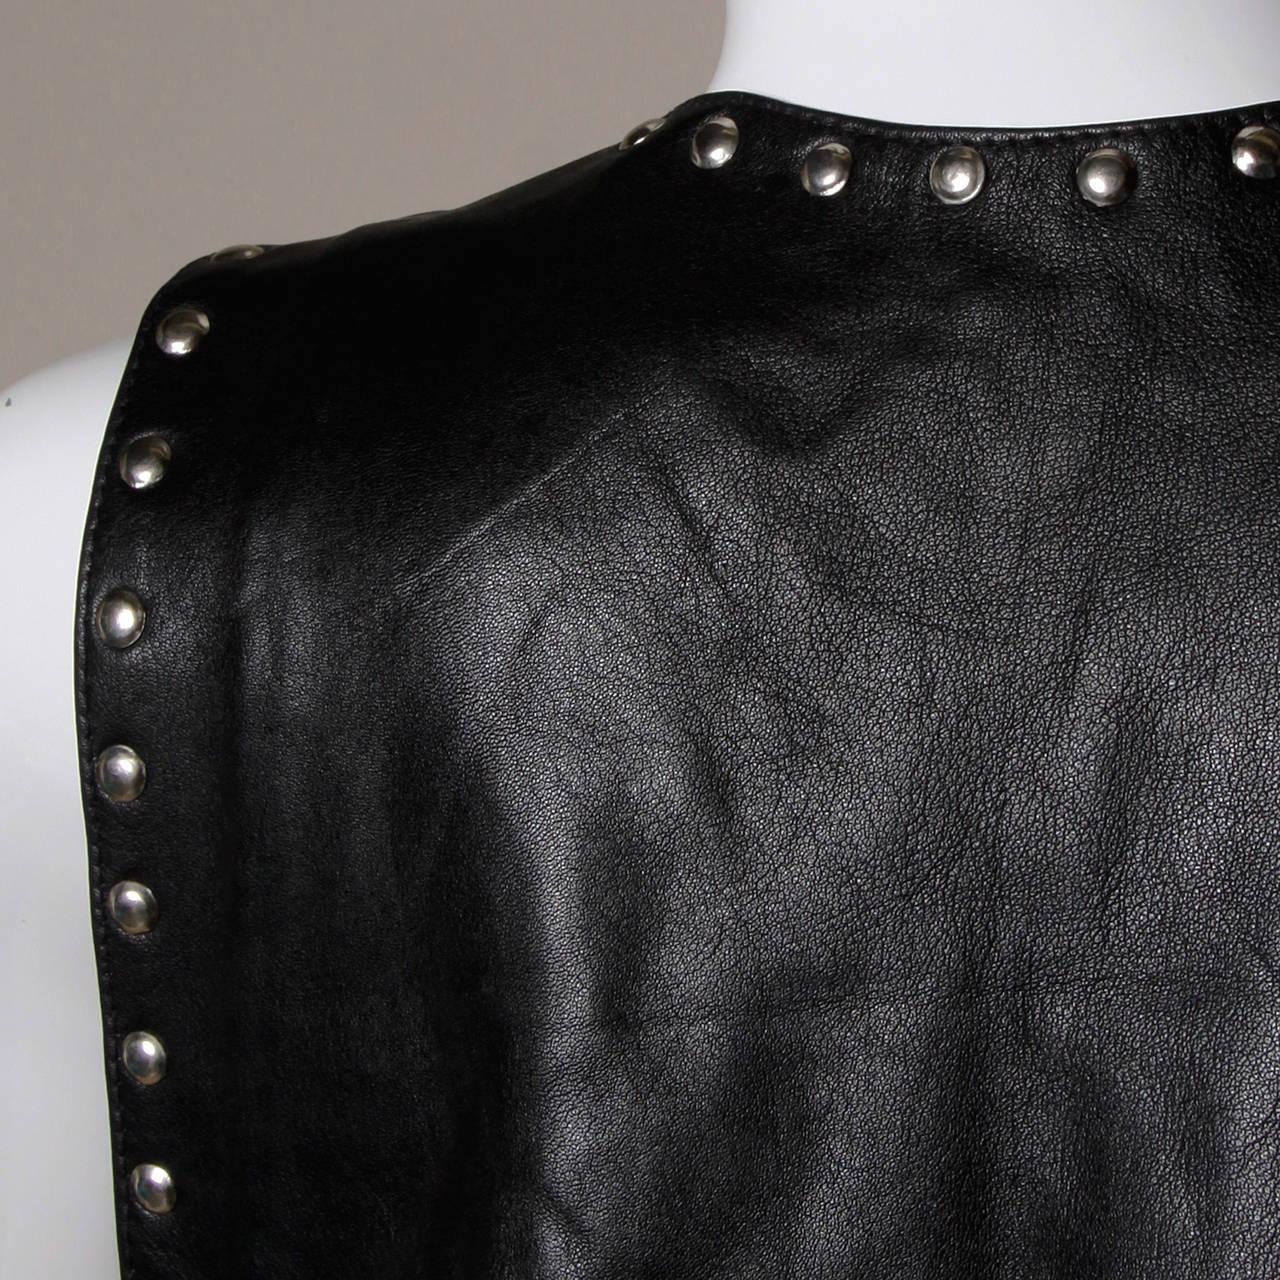 Vintage Leather Vest with Concho, Cowboy Boots, + Horse Studs 8